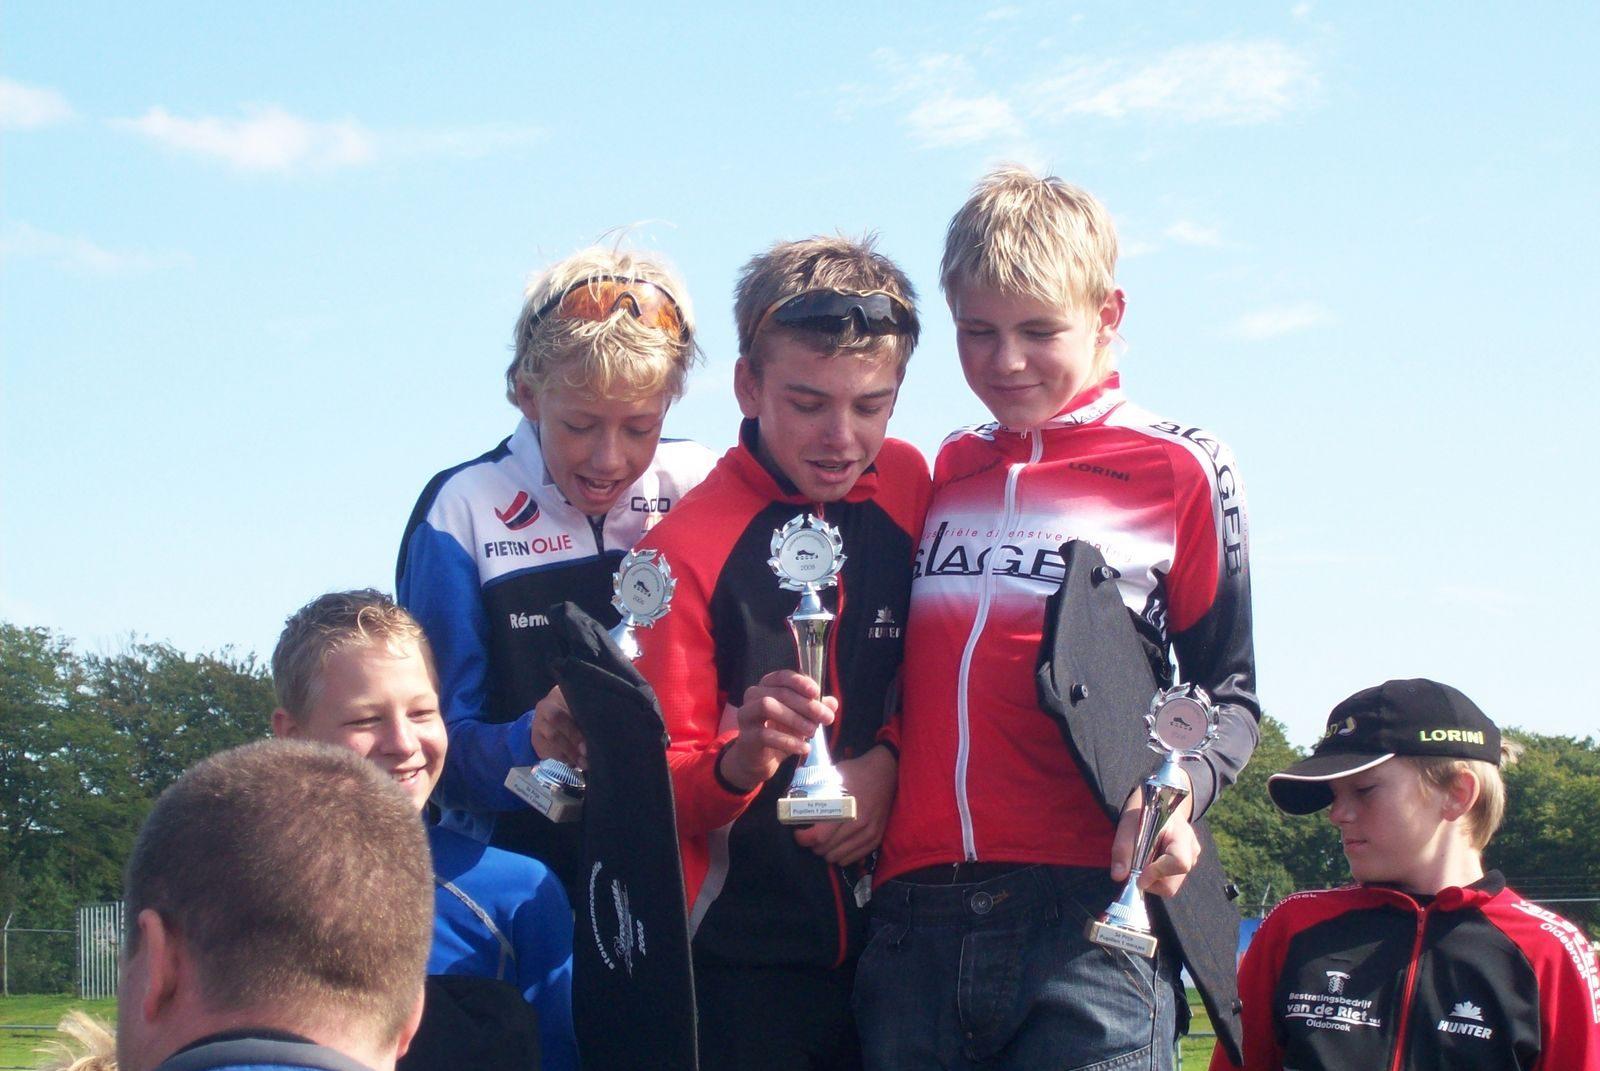 finale stouwdam 2008